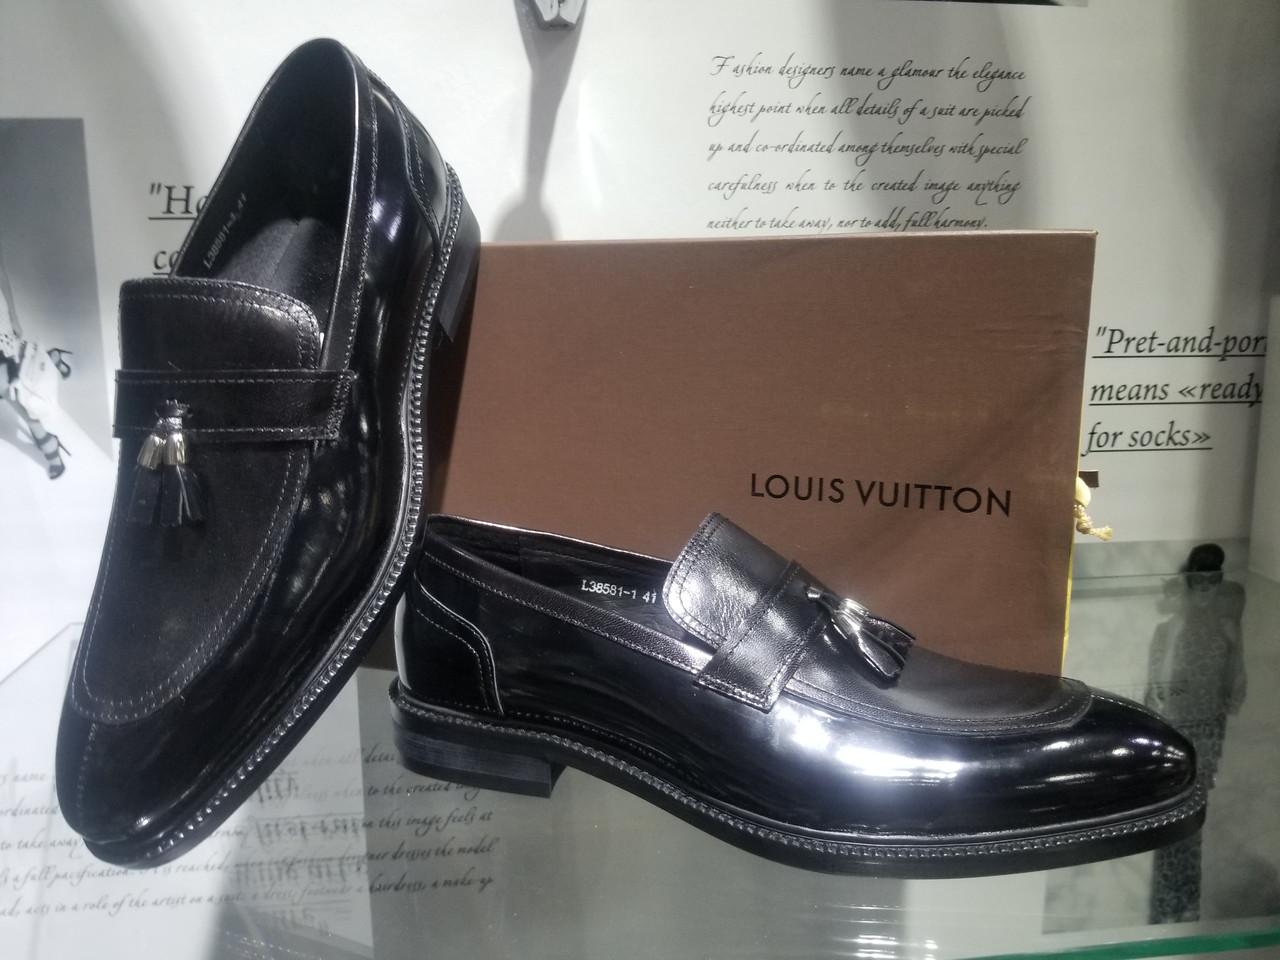 8180ed63e291 Мужские туфли-лоферы Louis Vuitton, глянцевая кожа, цвет черный, 40 ...